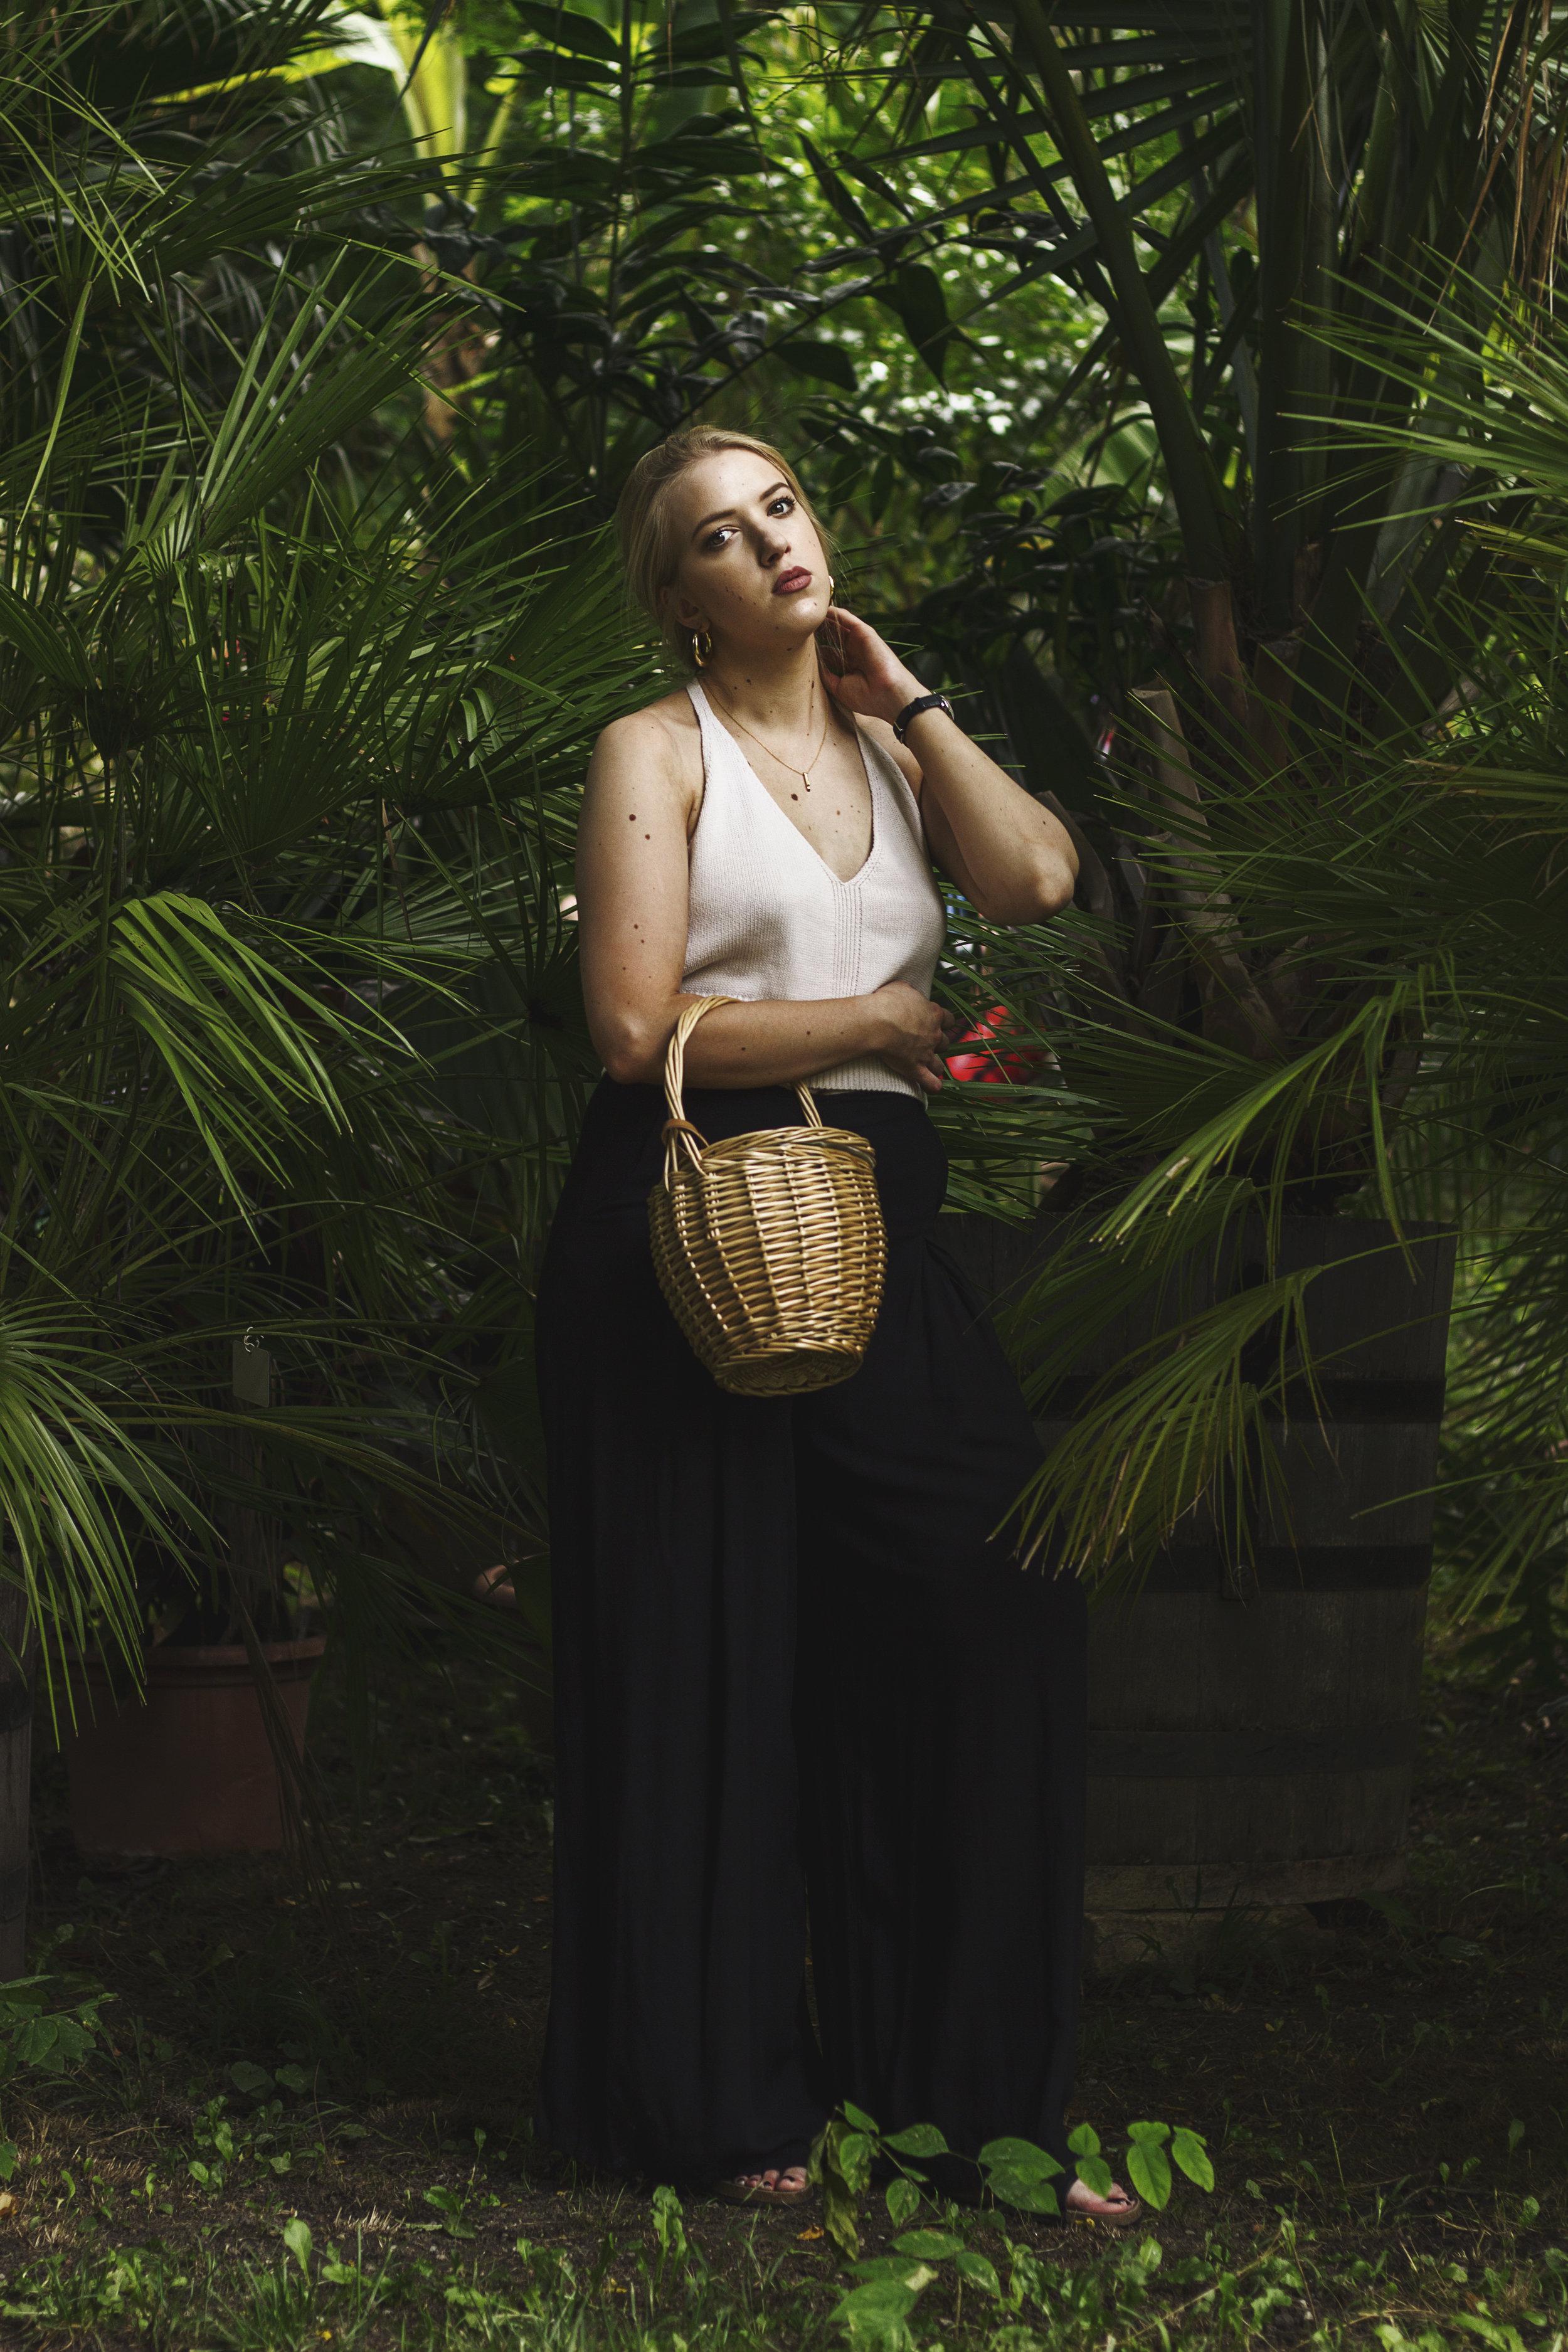 luka-lajic-fashion-photography-zagreb-croatia-anita-dundovic (6).jpg